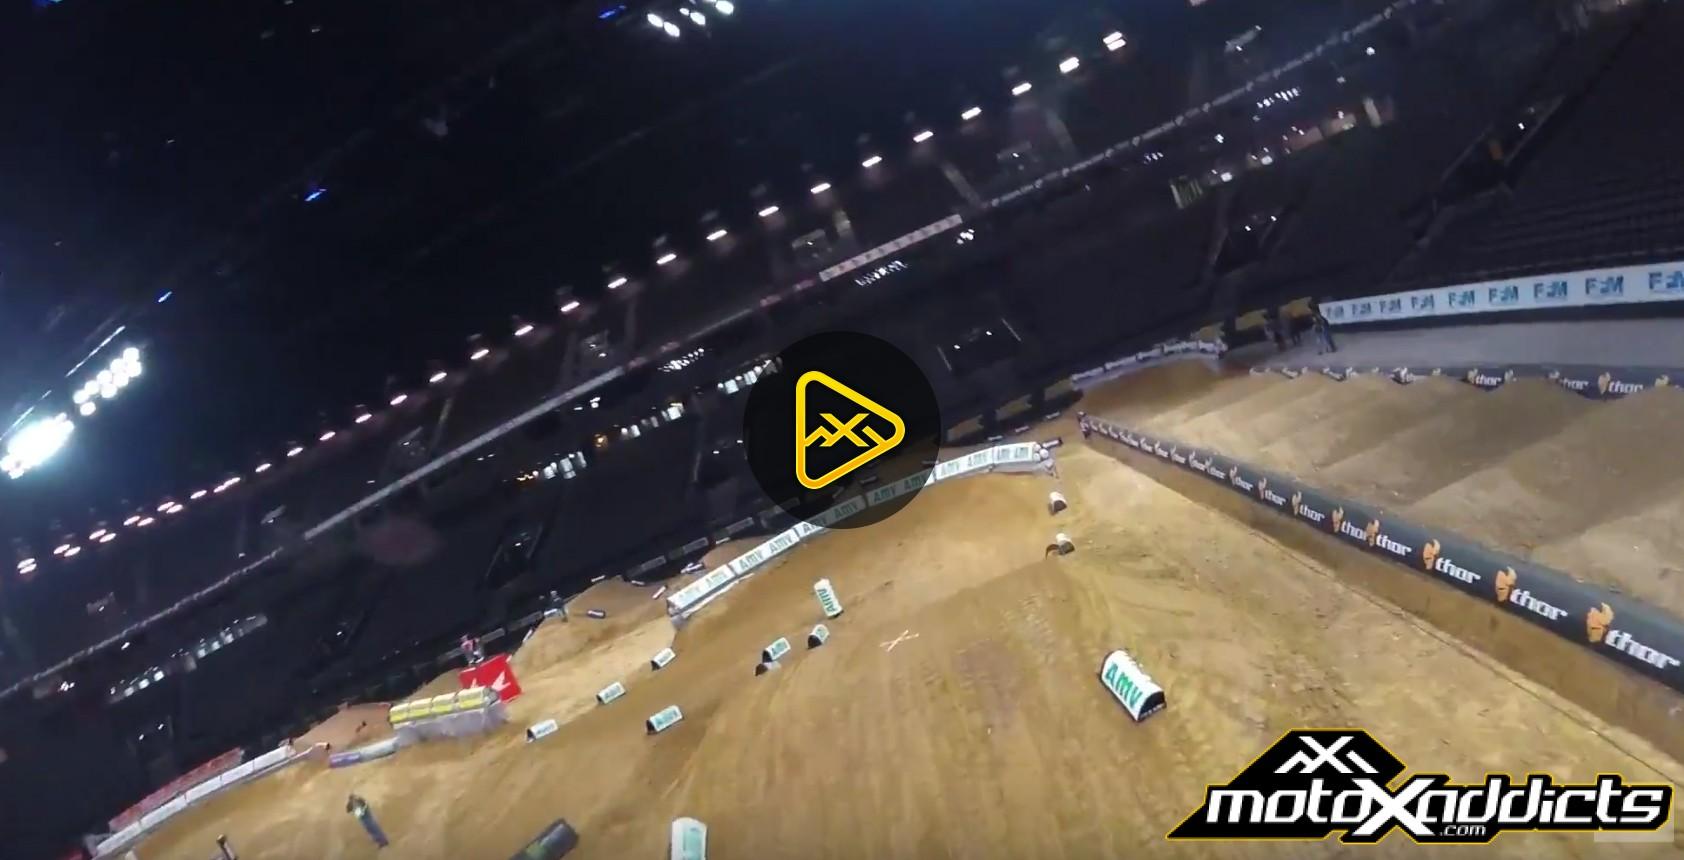 Helmet Cam: Cole Seely Hot Laps at 2017 Paris Supercross